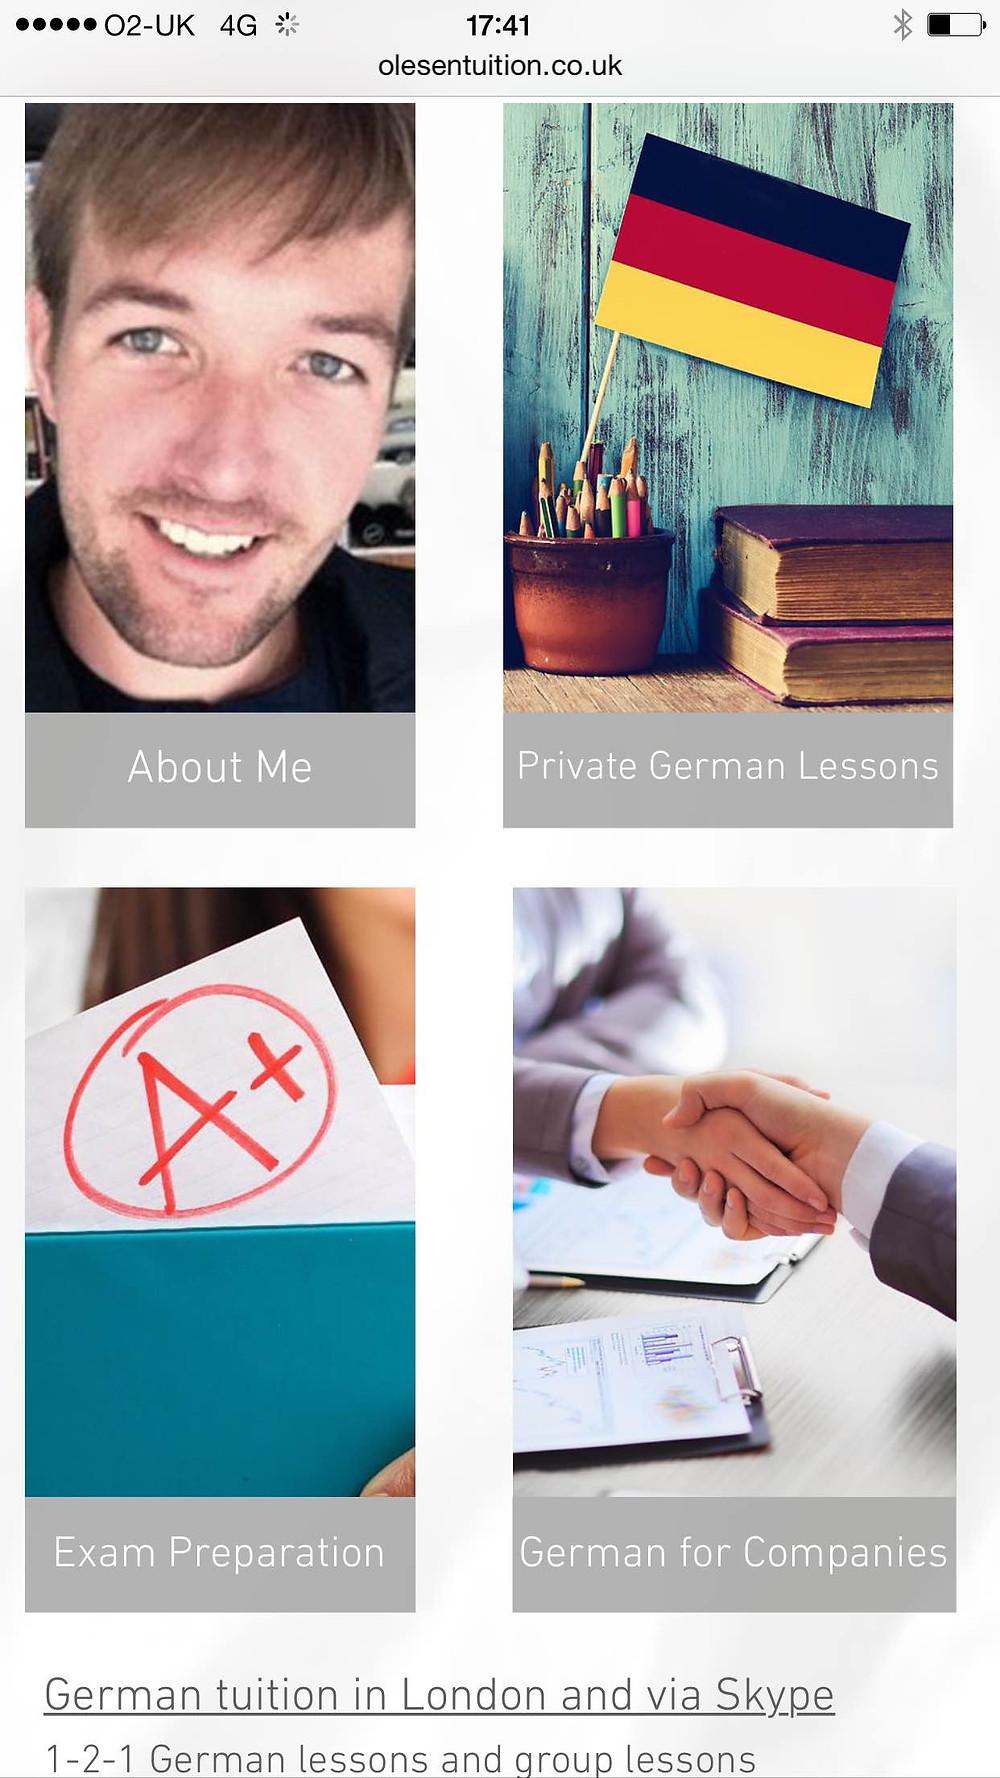 German lessons London, German classes London, german courses london, german tuition london, german tutoring london